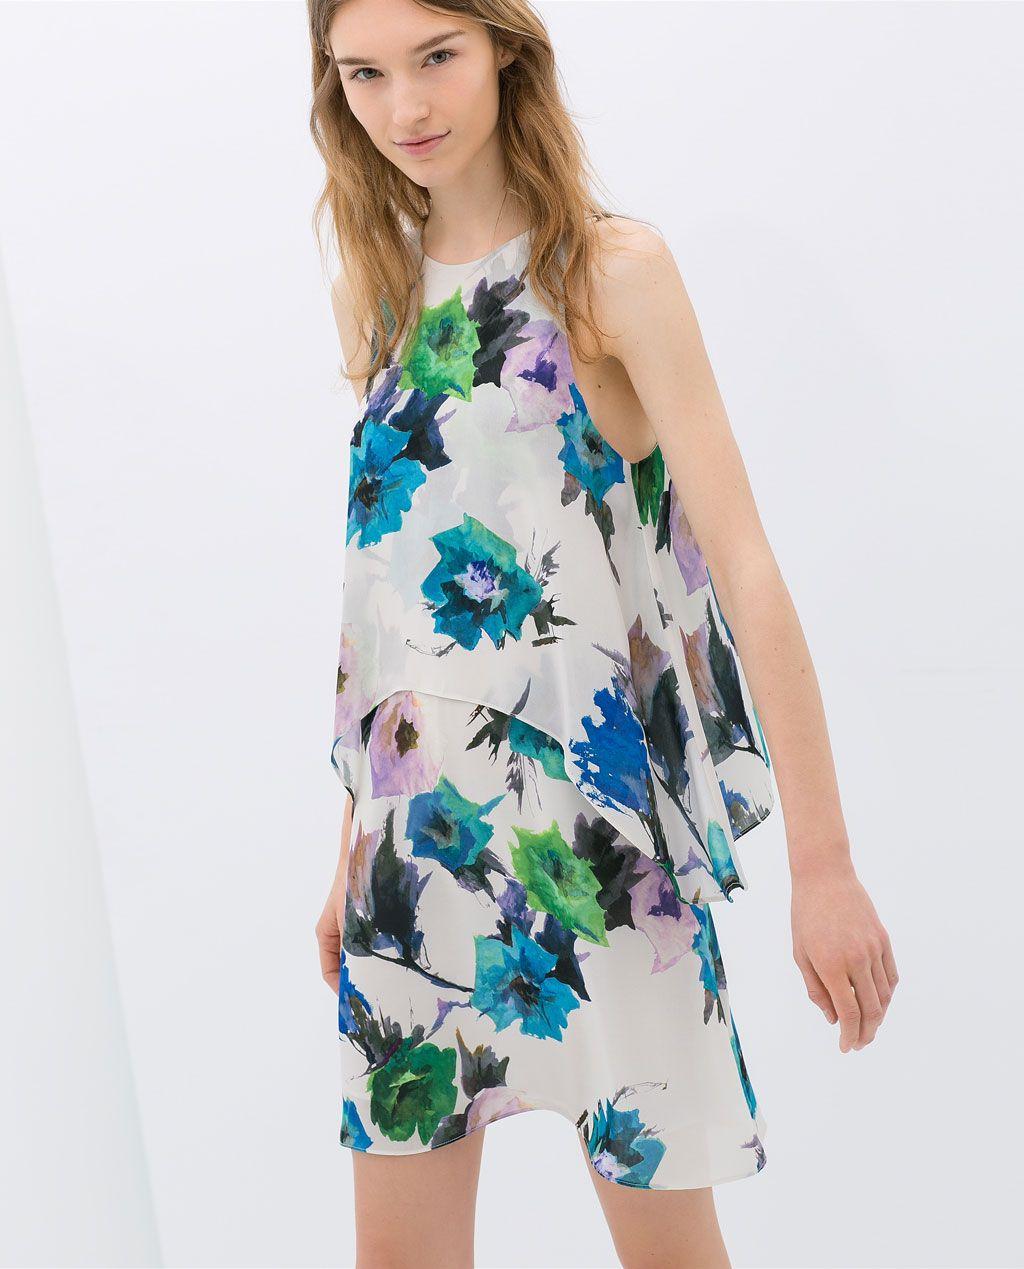 Layered printed dress from zara style me pretty pinterest